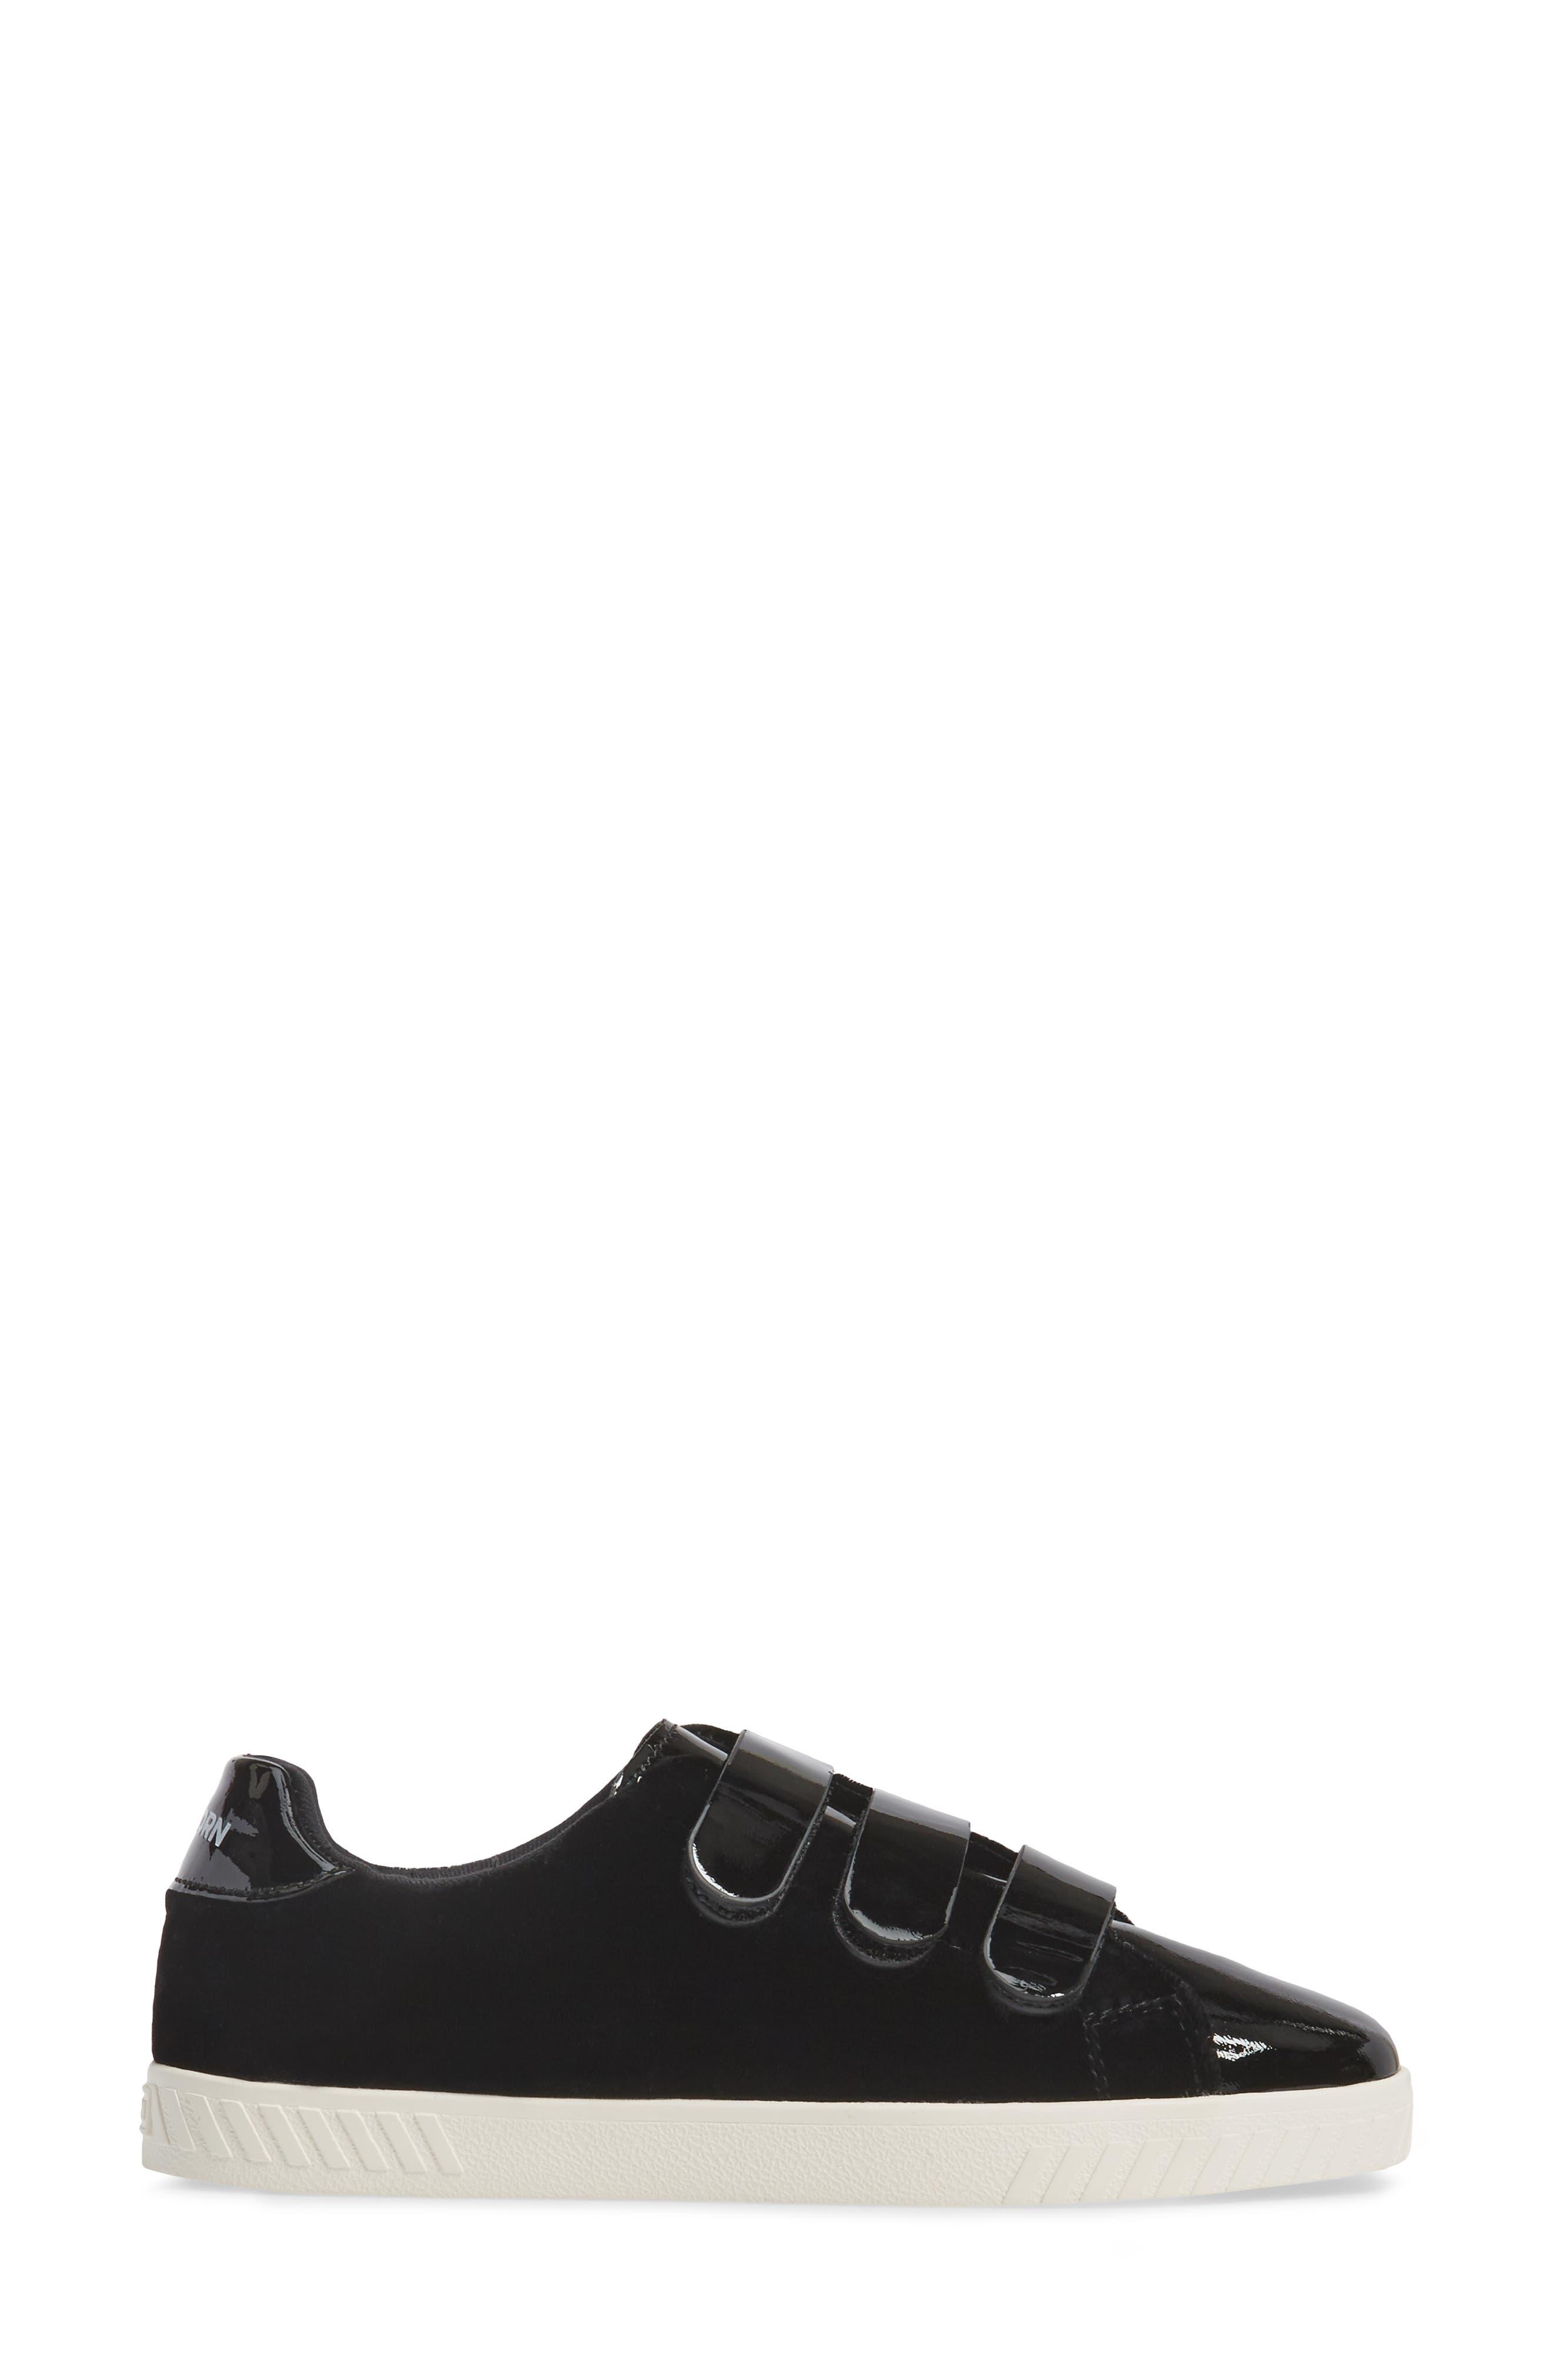 Carry Sneaker,                             Alternate thumbnail 3, color,                             001